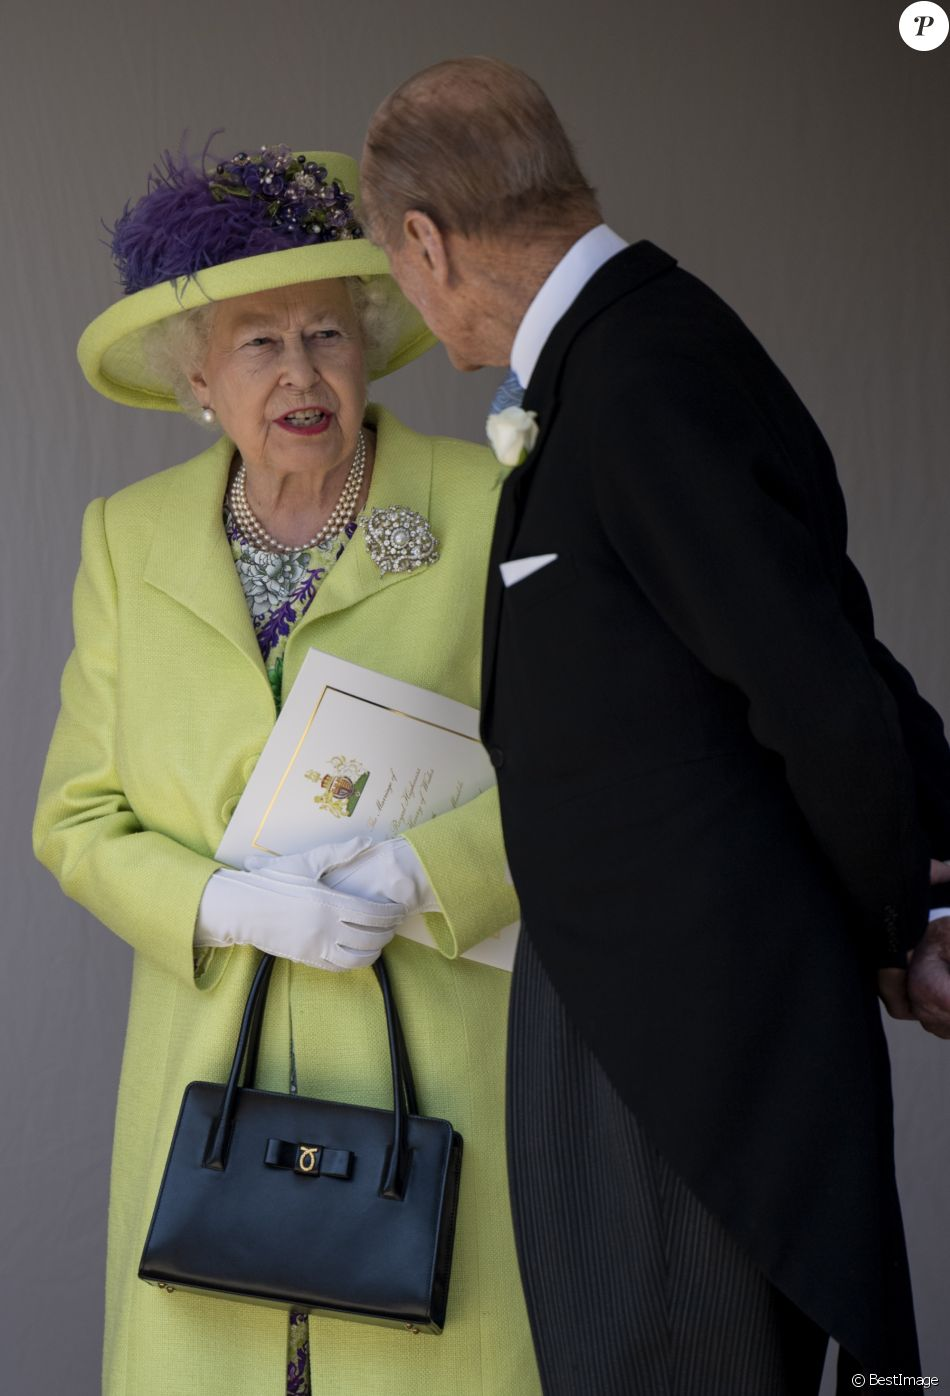 La reine Elizabeth II et le prince Philip, duc d\u0027Edimbourg, au mariage du  prince Harry et de Meghan Markle au château de Windsor, le 19 mai 2018.